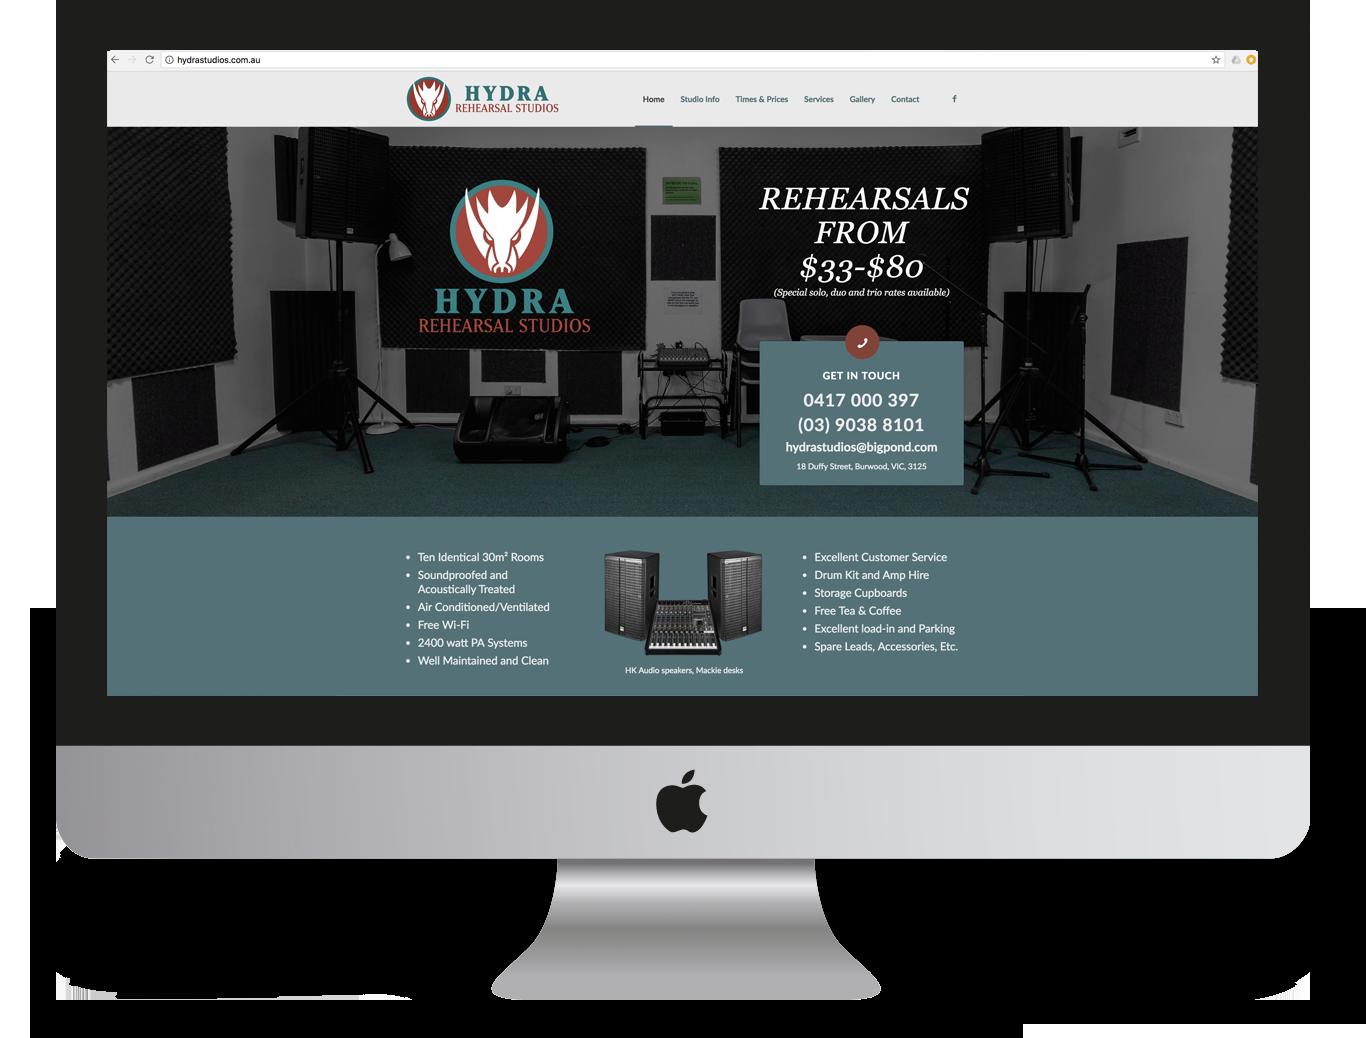 Hydra Studios Website Design and Development - Ignite Group Website Development - Miki Media   Melbourne Web Design Services